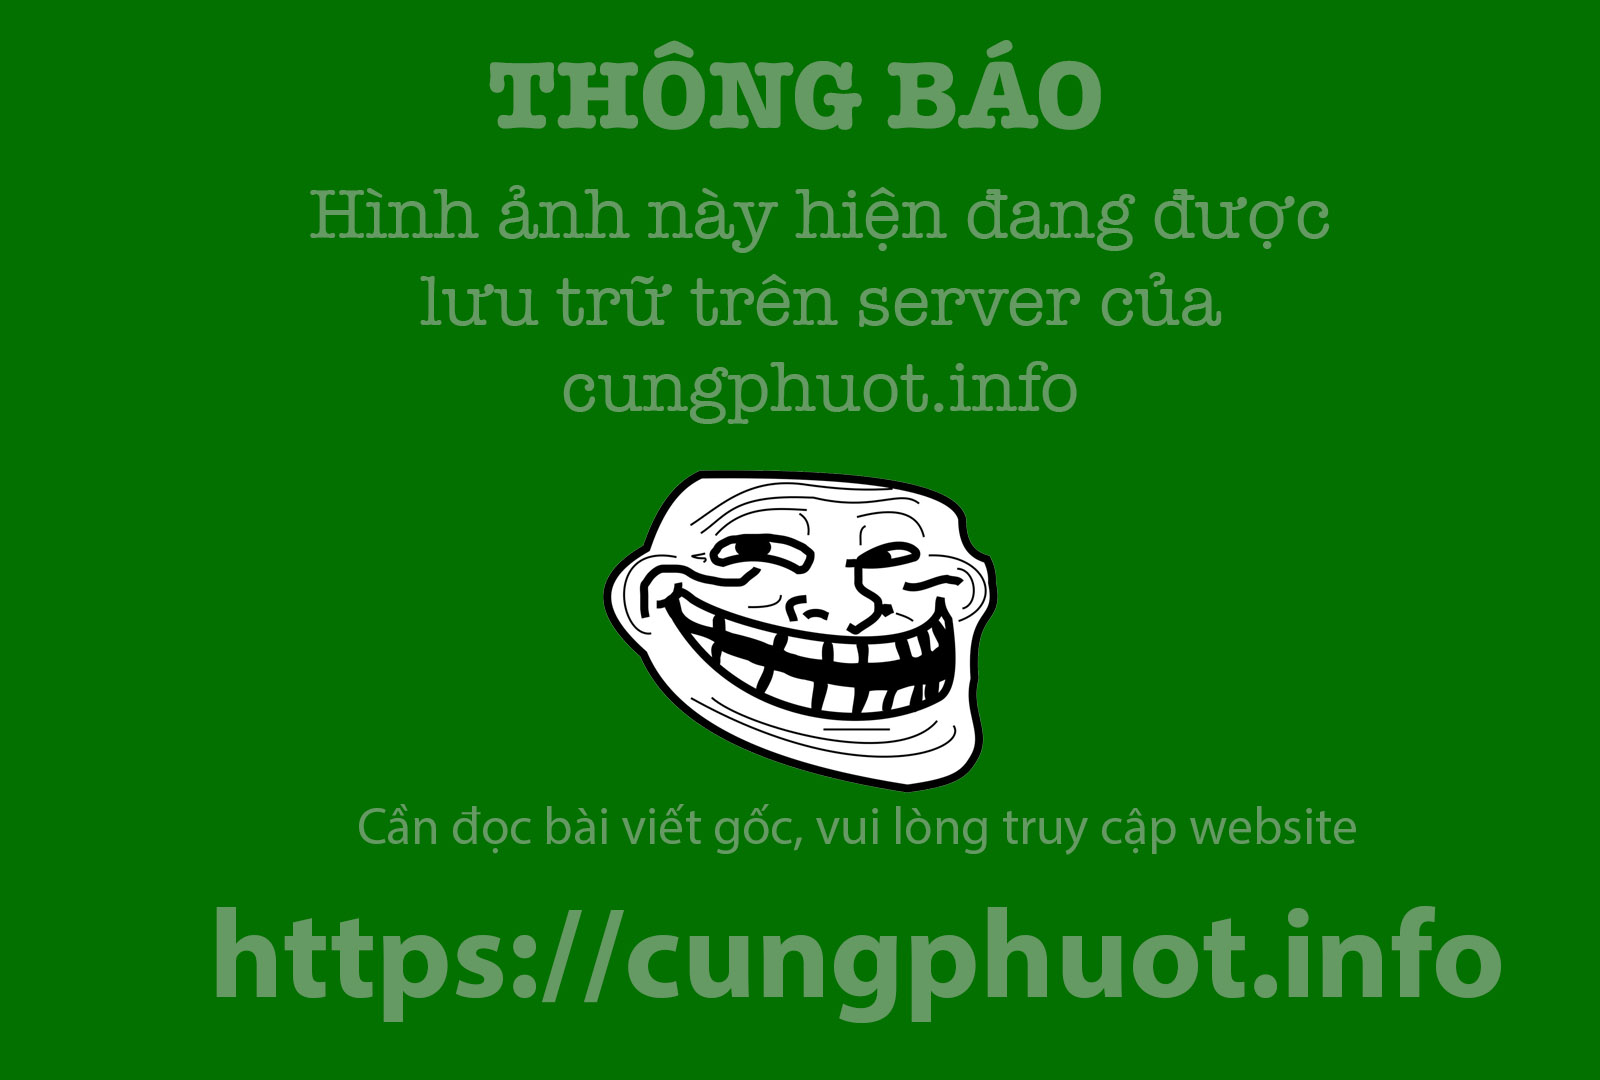 Dan phuot me man ve dep ky vi cua hang Prai o Quang Tri hinh anh 5